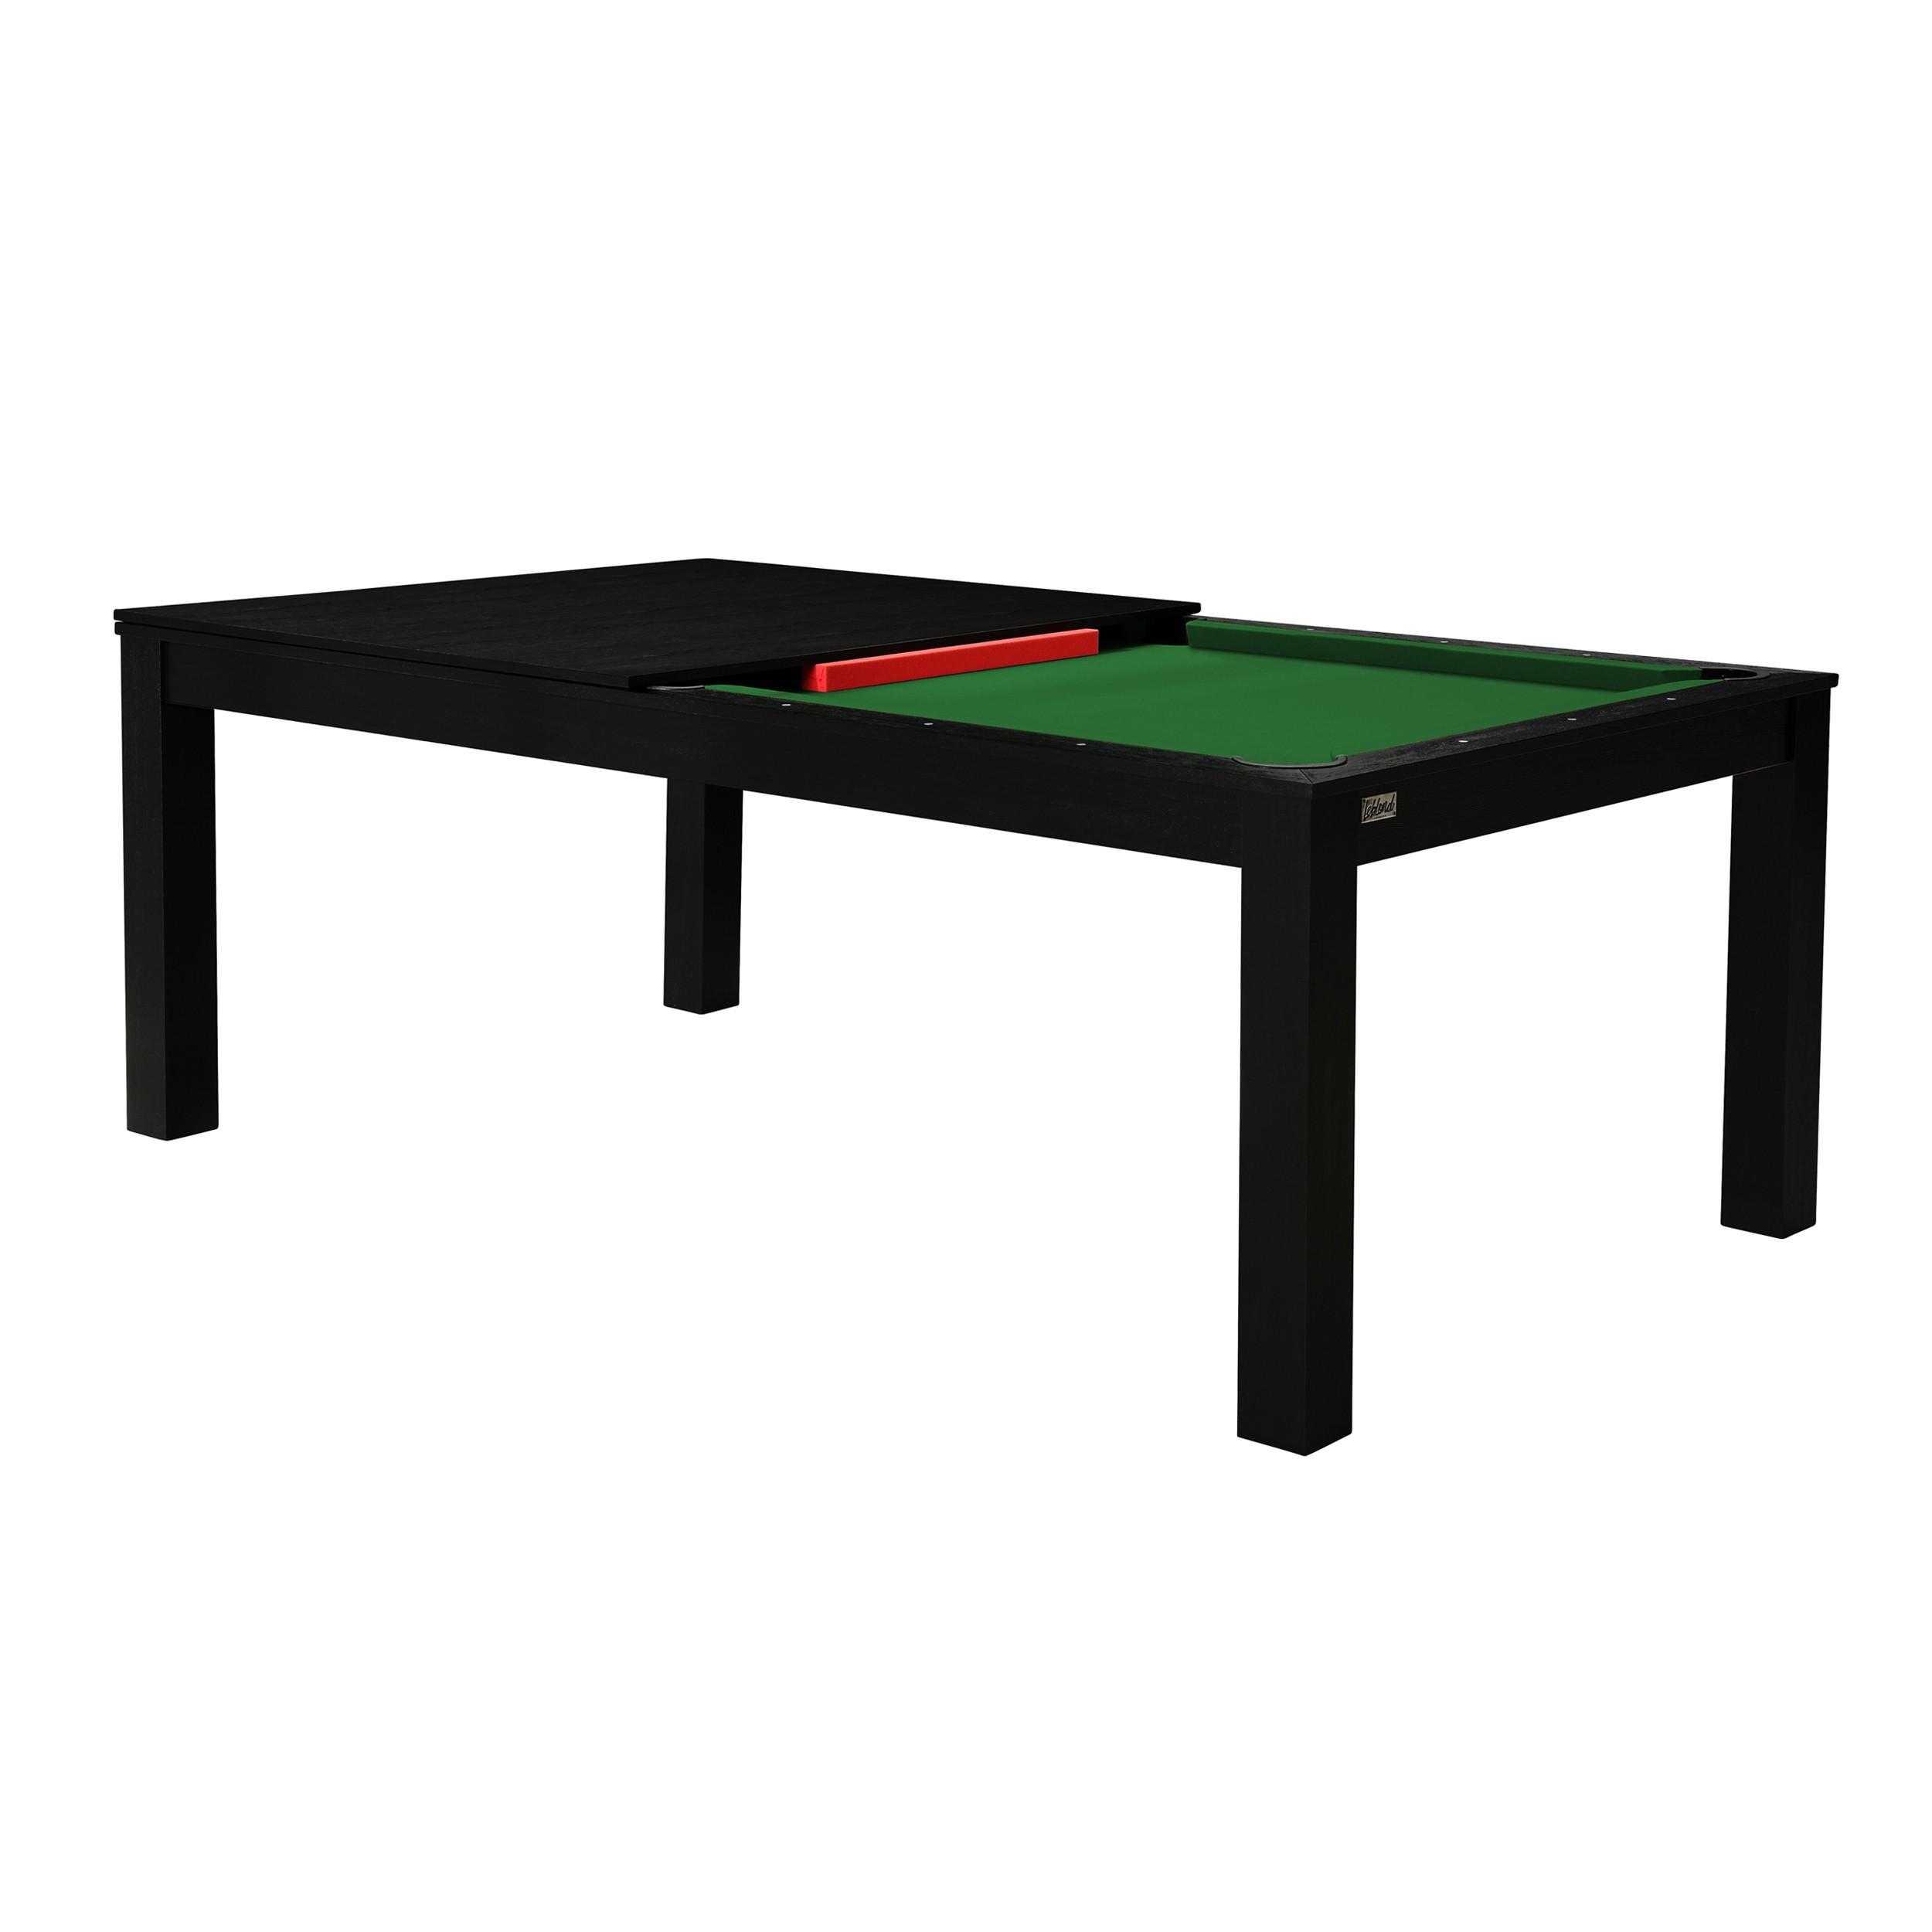 billard table convertible noir tapis vert choisissez les billards tables convertibles noirs. Black Bedroom Furniture Sets. Home Design Ideas